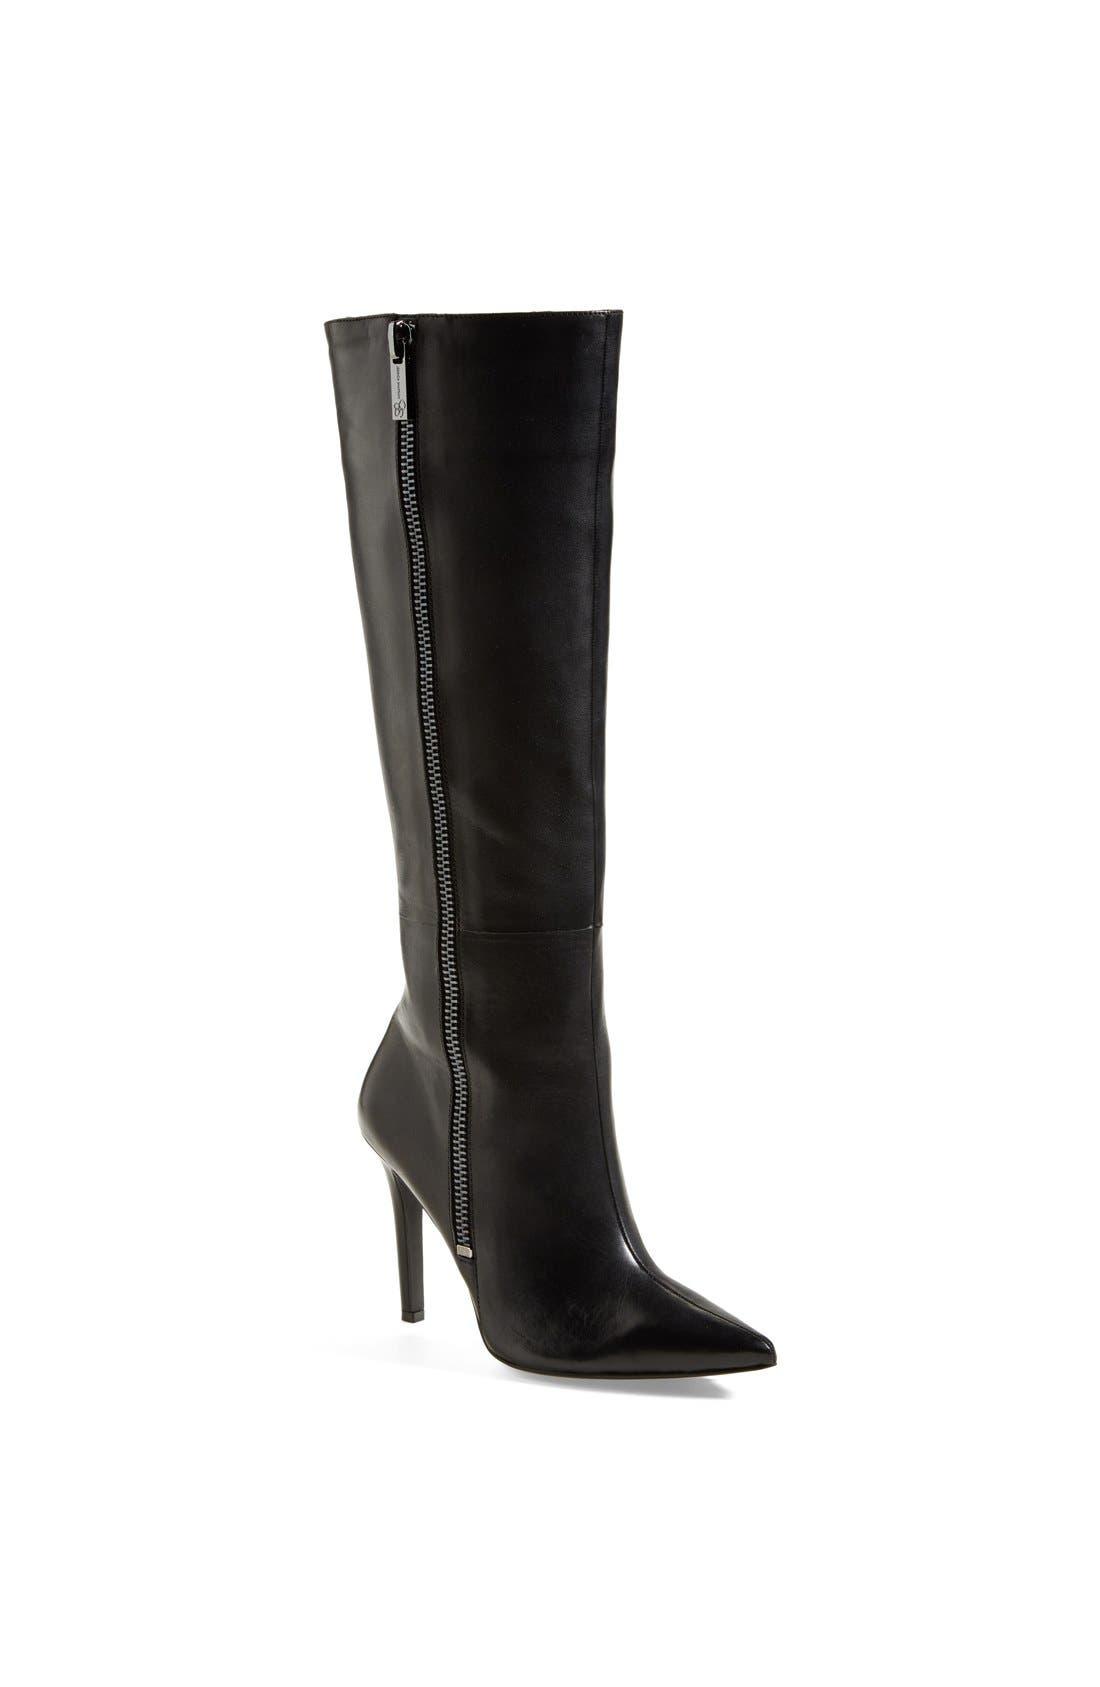 Main Image - Jessica Simpson 'Capitani' Pointy Toe Knee High Boot (Women)